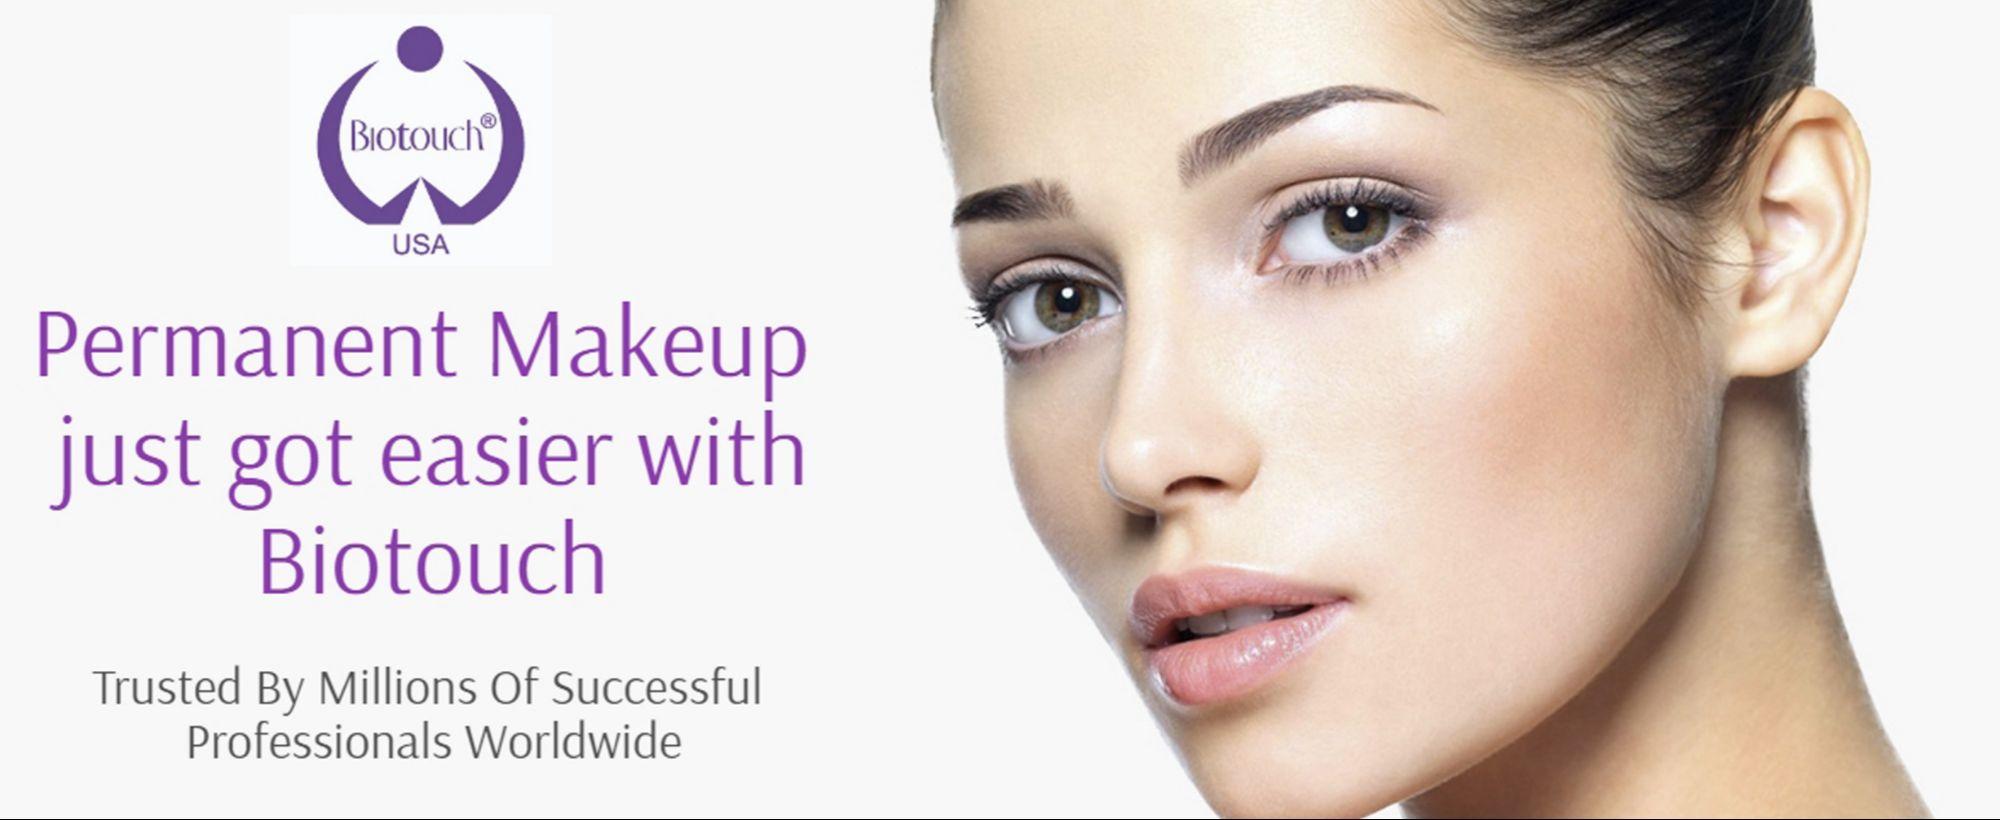 Eternal Beauty - UK's Premier Biotouch Distributor